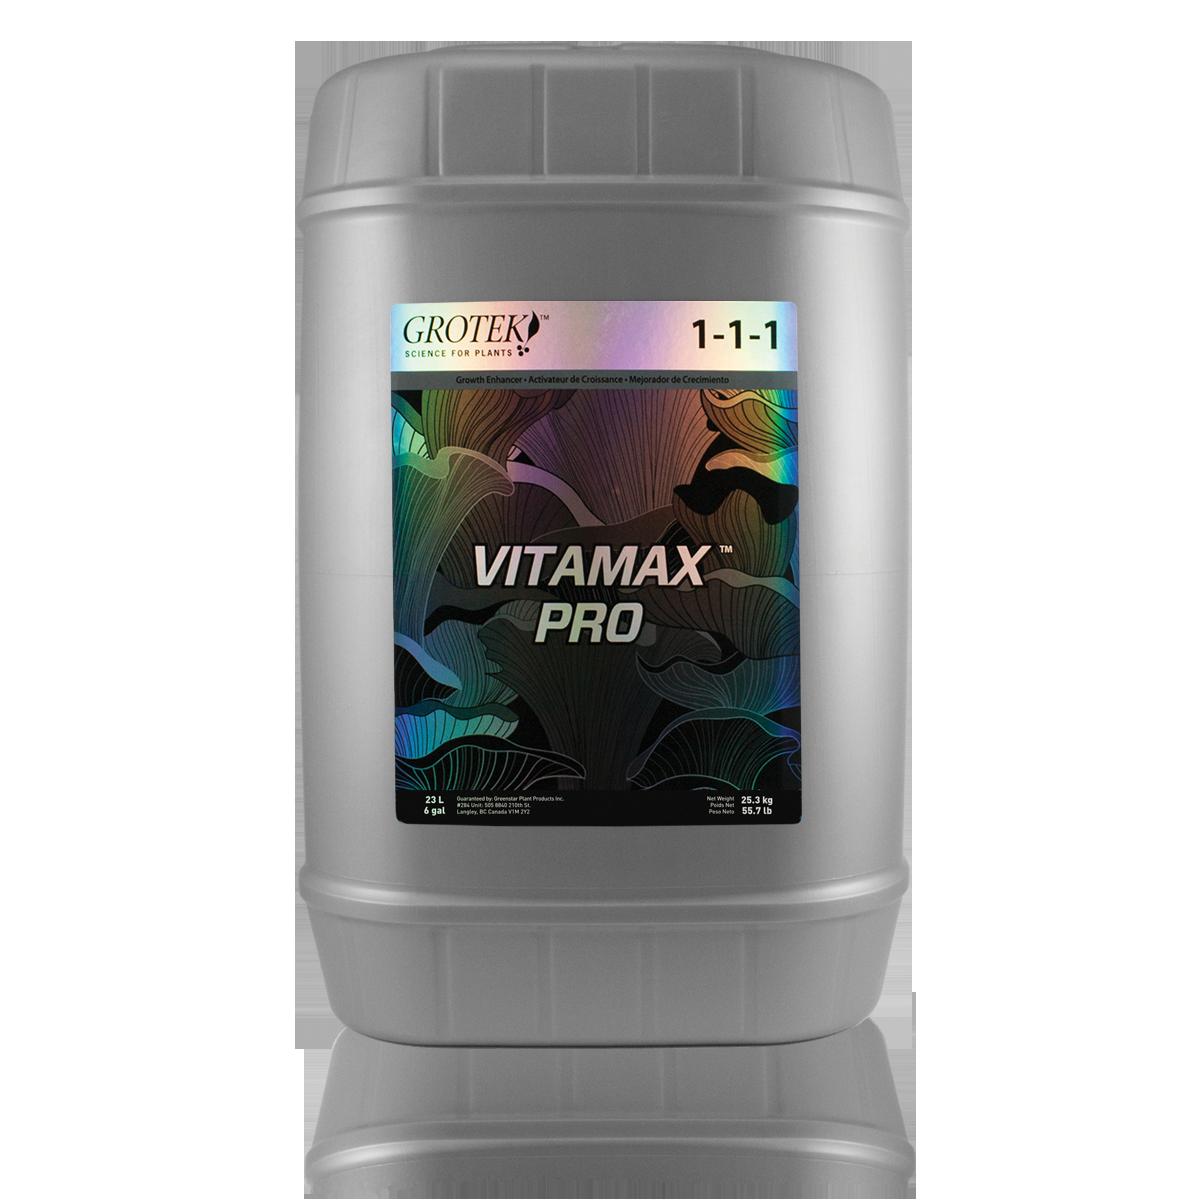 Grotek Grotek - Vitamax Pro